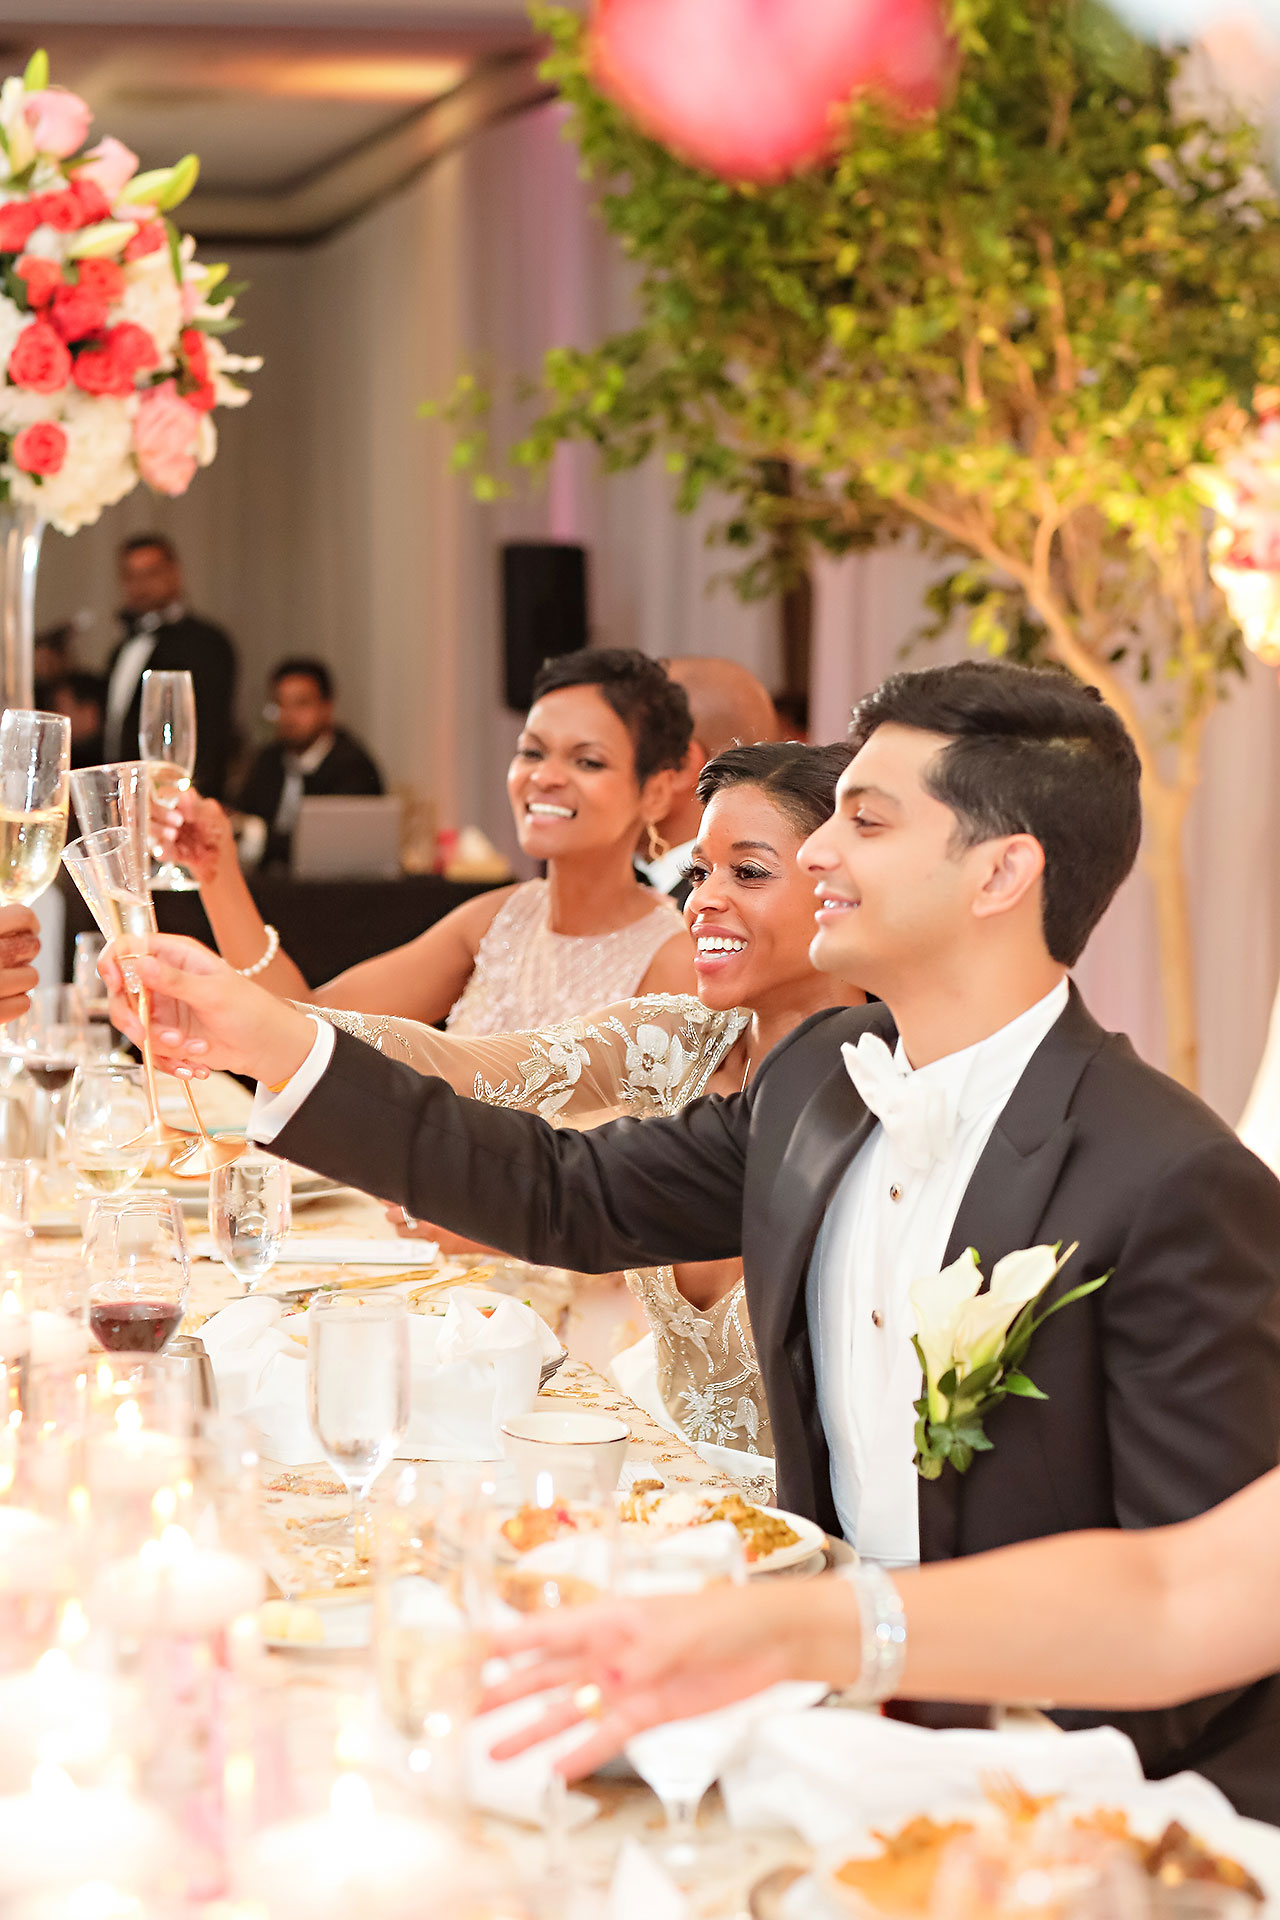 Joie Nikhil JW Marriott Indianapolis Wedding 106